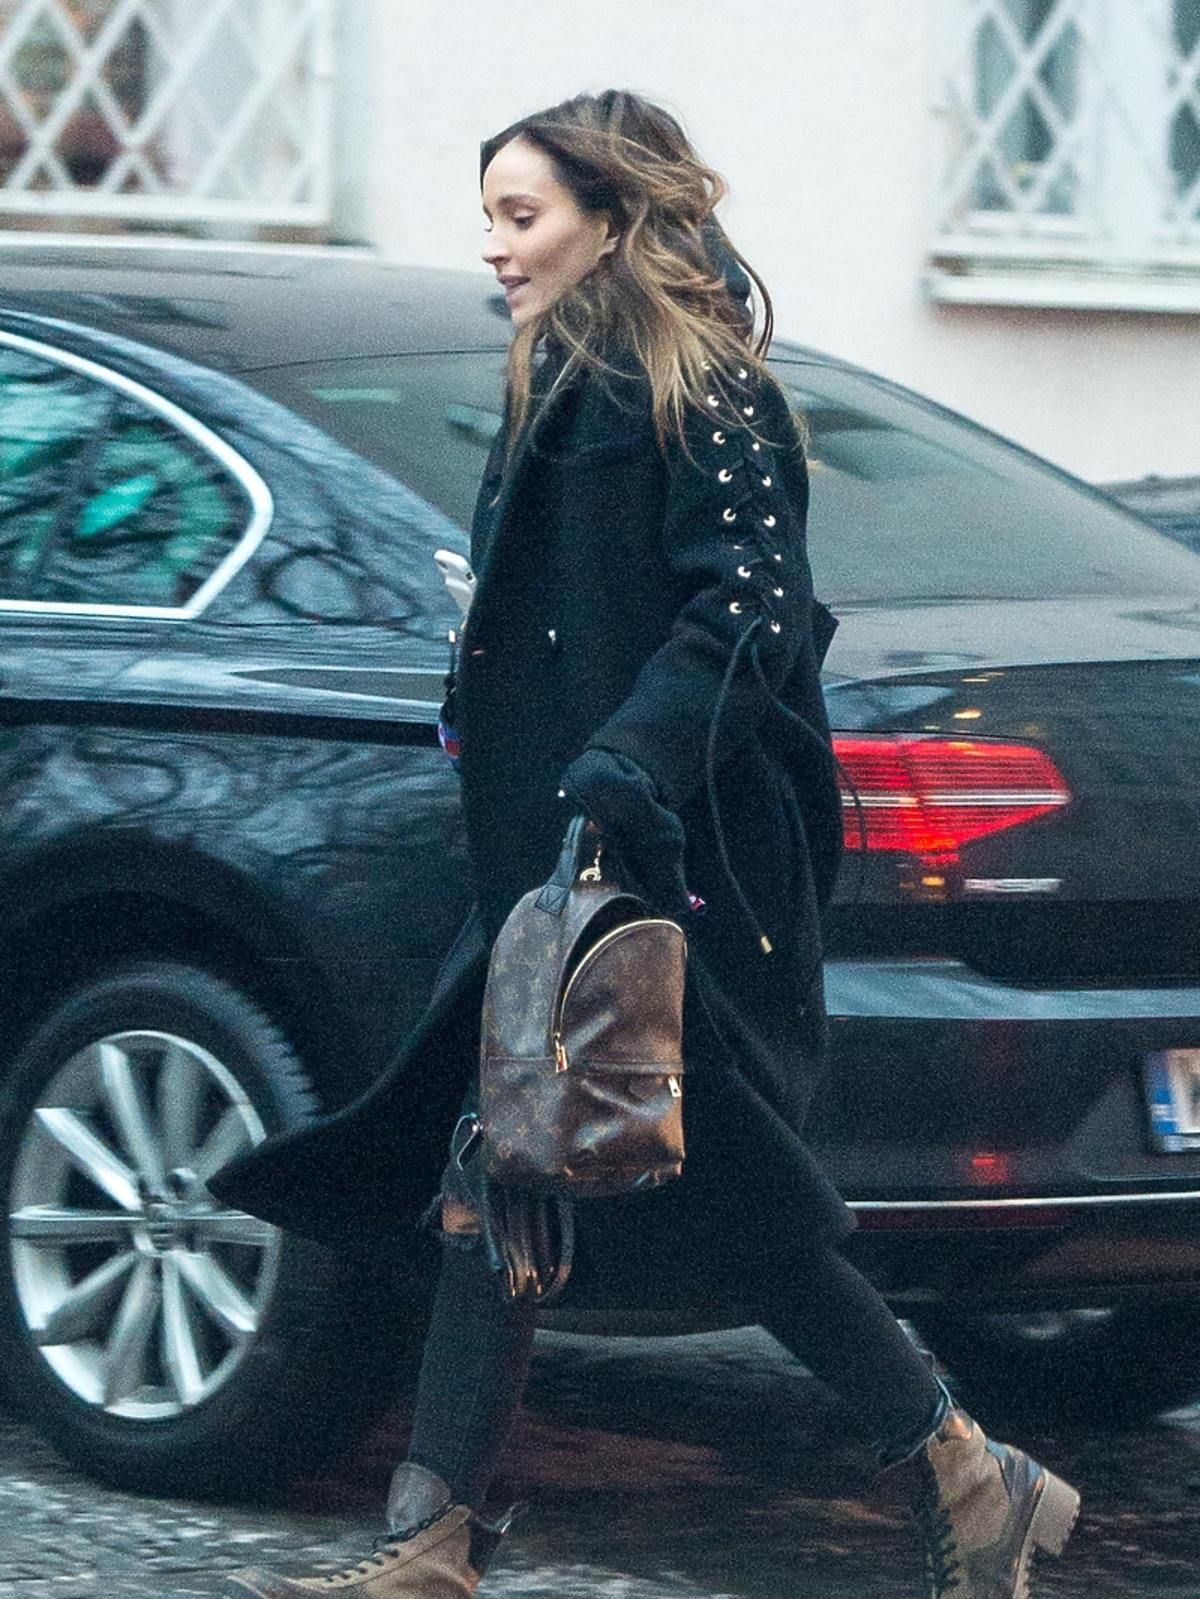 Marina z plecakiem